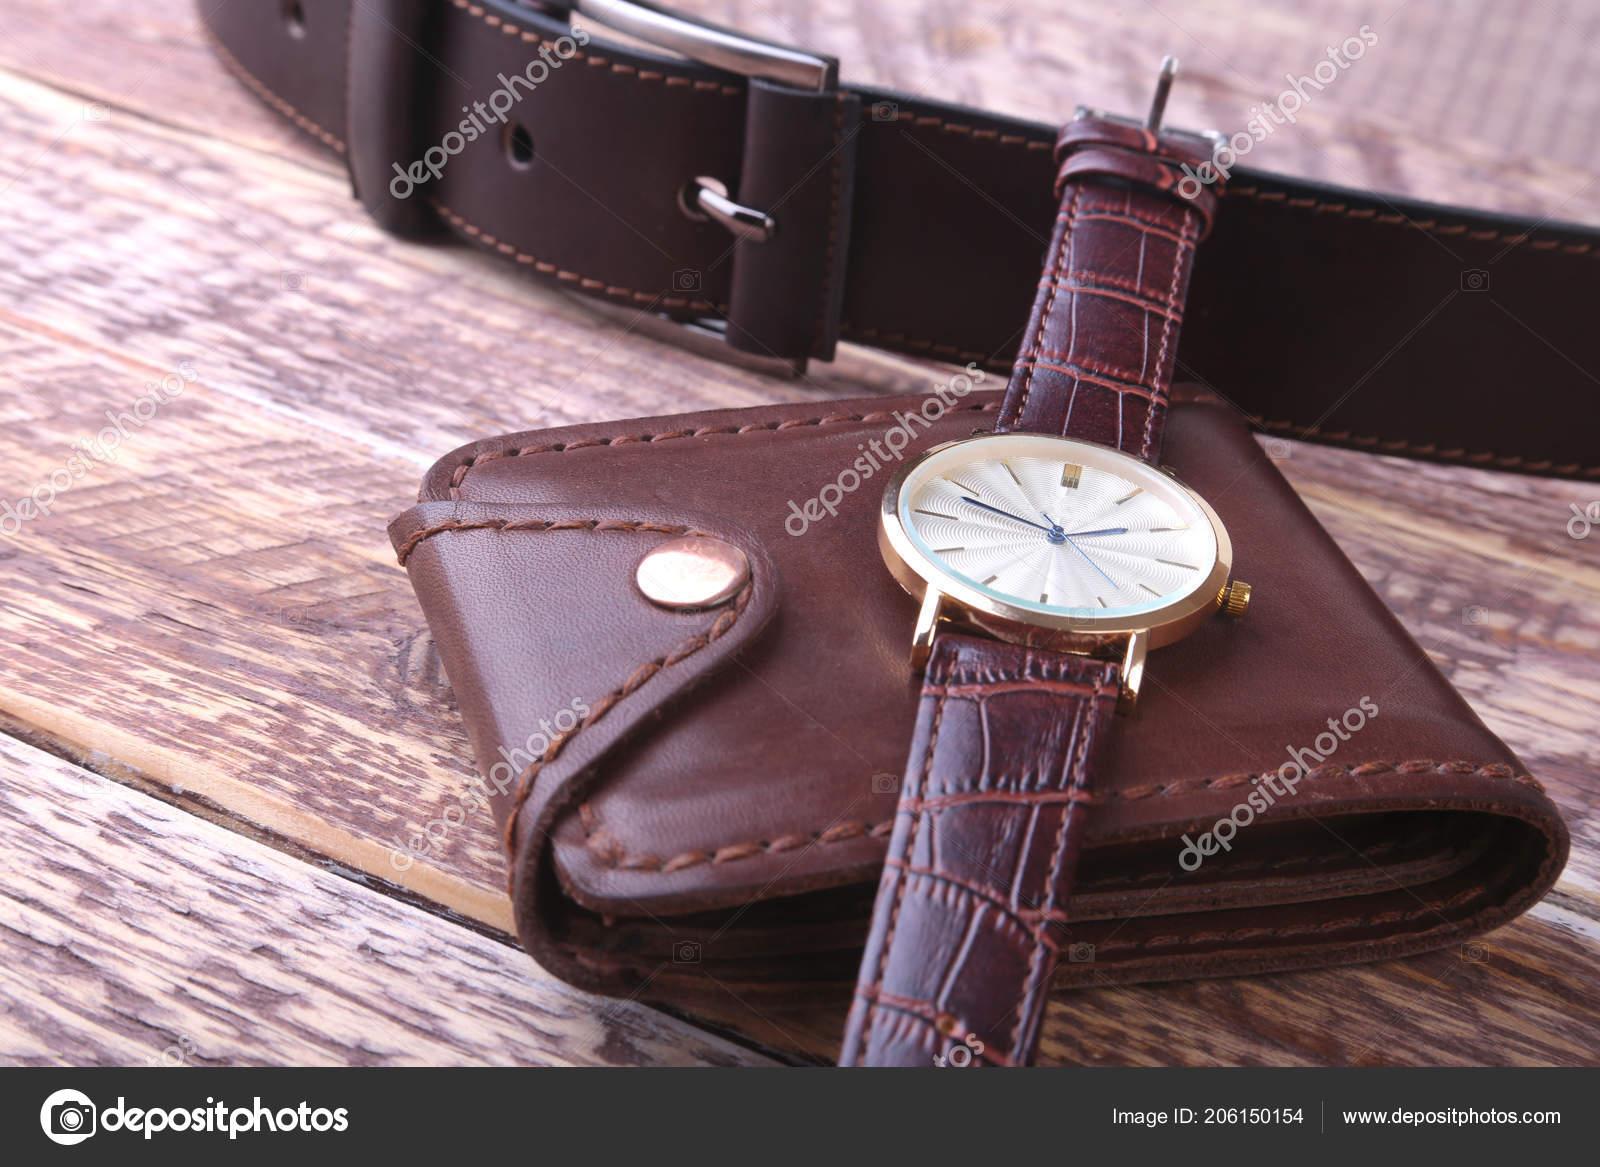 f993e7d3dc04 Accesorios para hombre con monedero de cuero marrón